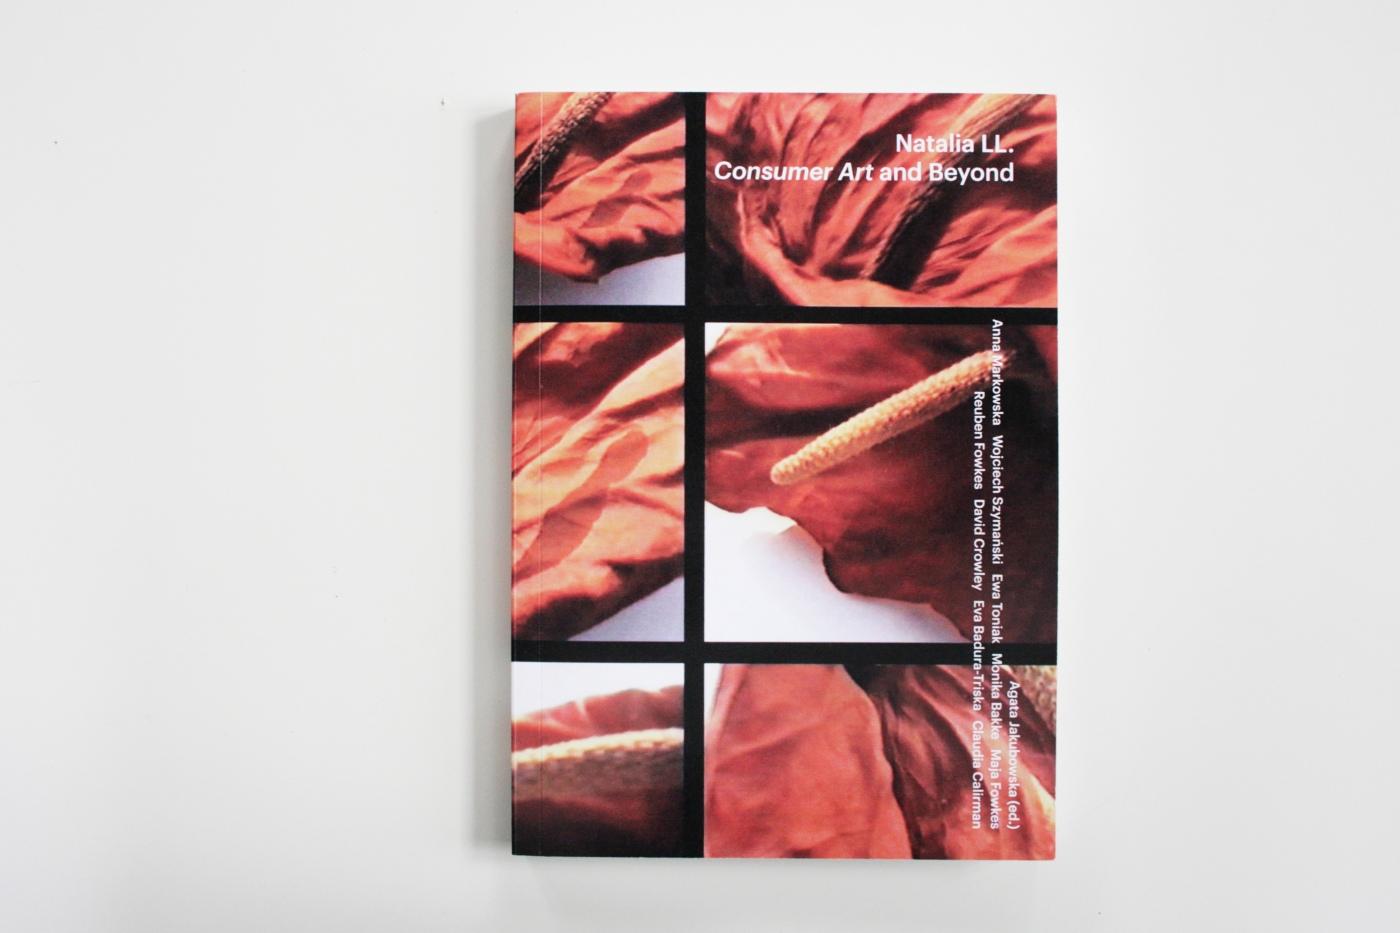 """Natalia LL. Consumer Art and Beyond"", red. Agata Jakubowska (źródło: materiały prasowe organizatora)"